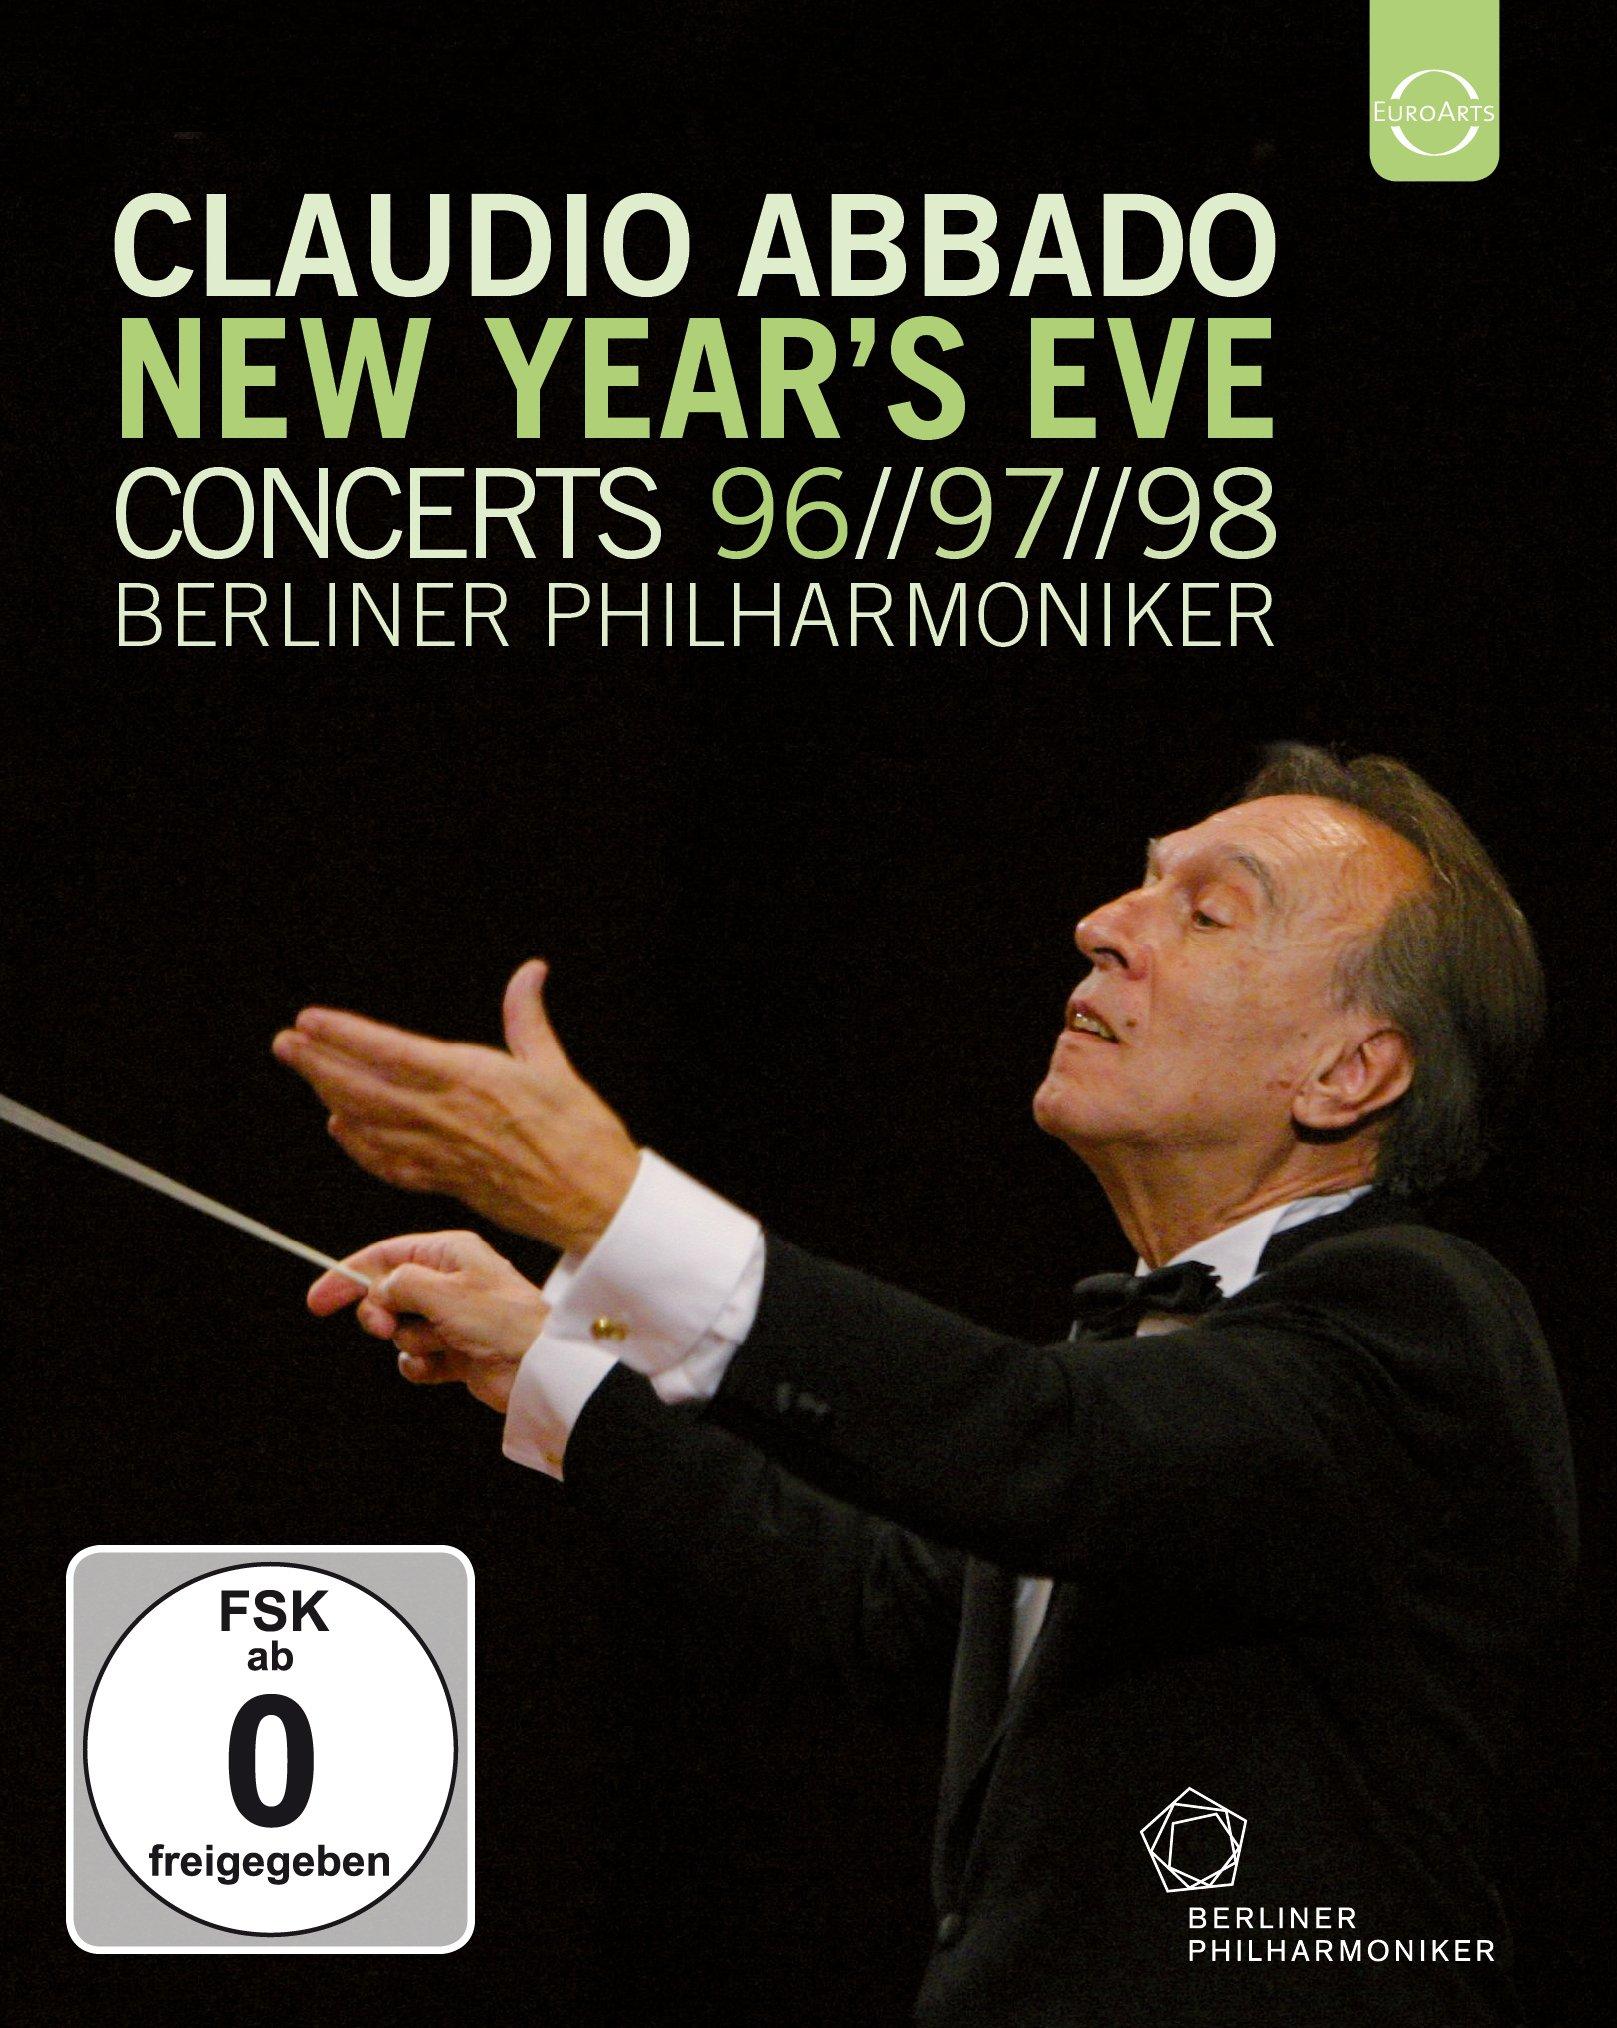 Claudio Abbado New Year's Eve Concerts 96-97-98 - Berliner Philharmoniker (2015) 3BD, Blu-ray 1080i AVC LPCM 2.0